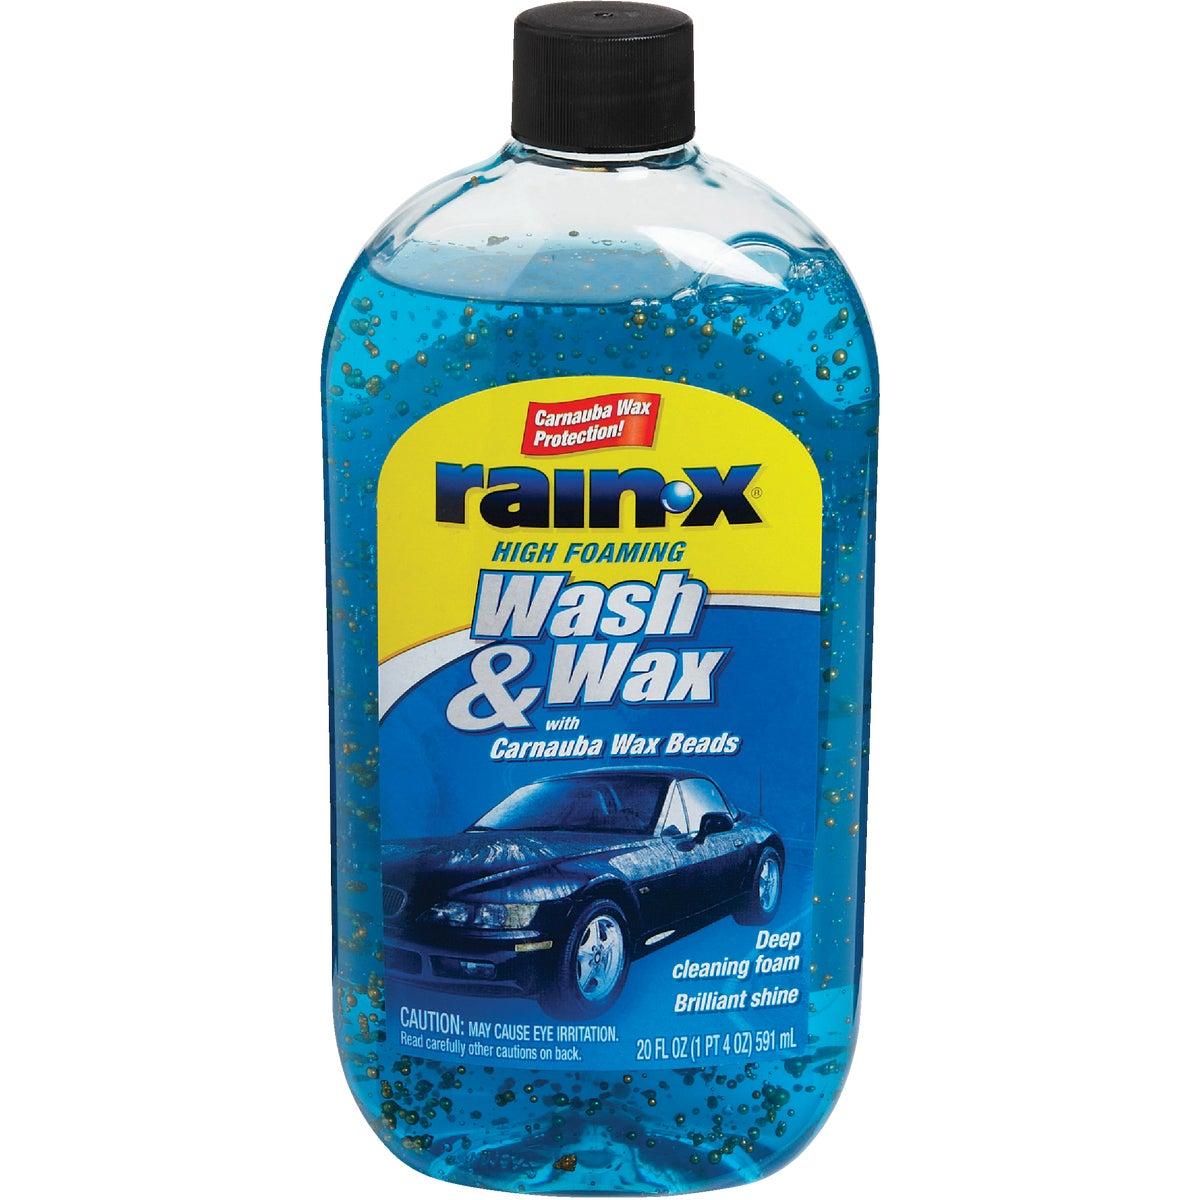 20OZ WASH & WAX CAR WASH